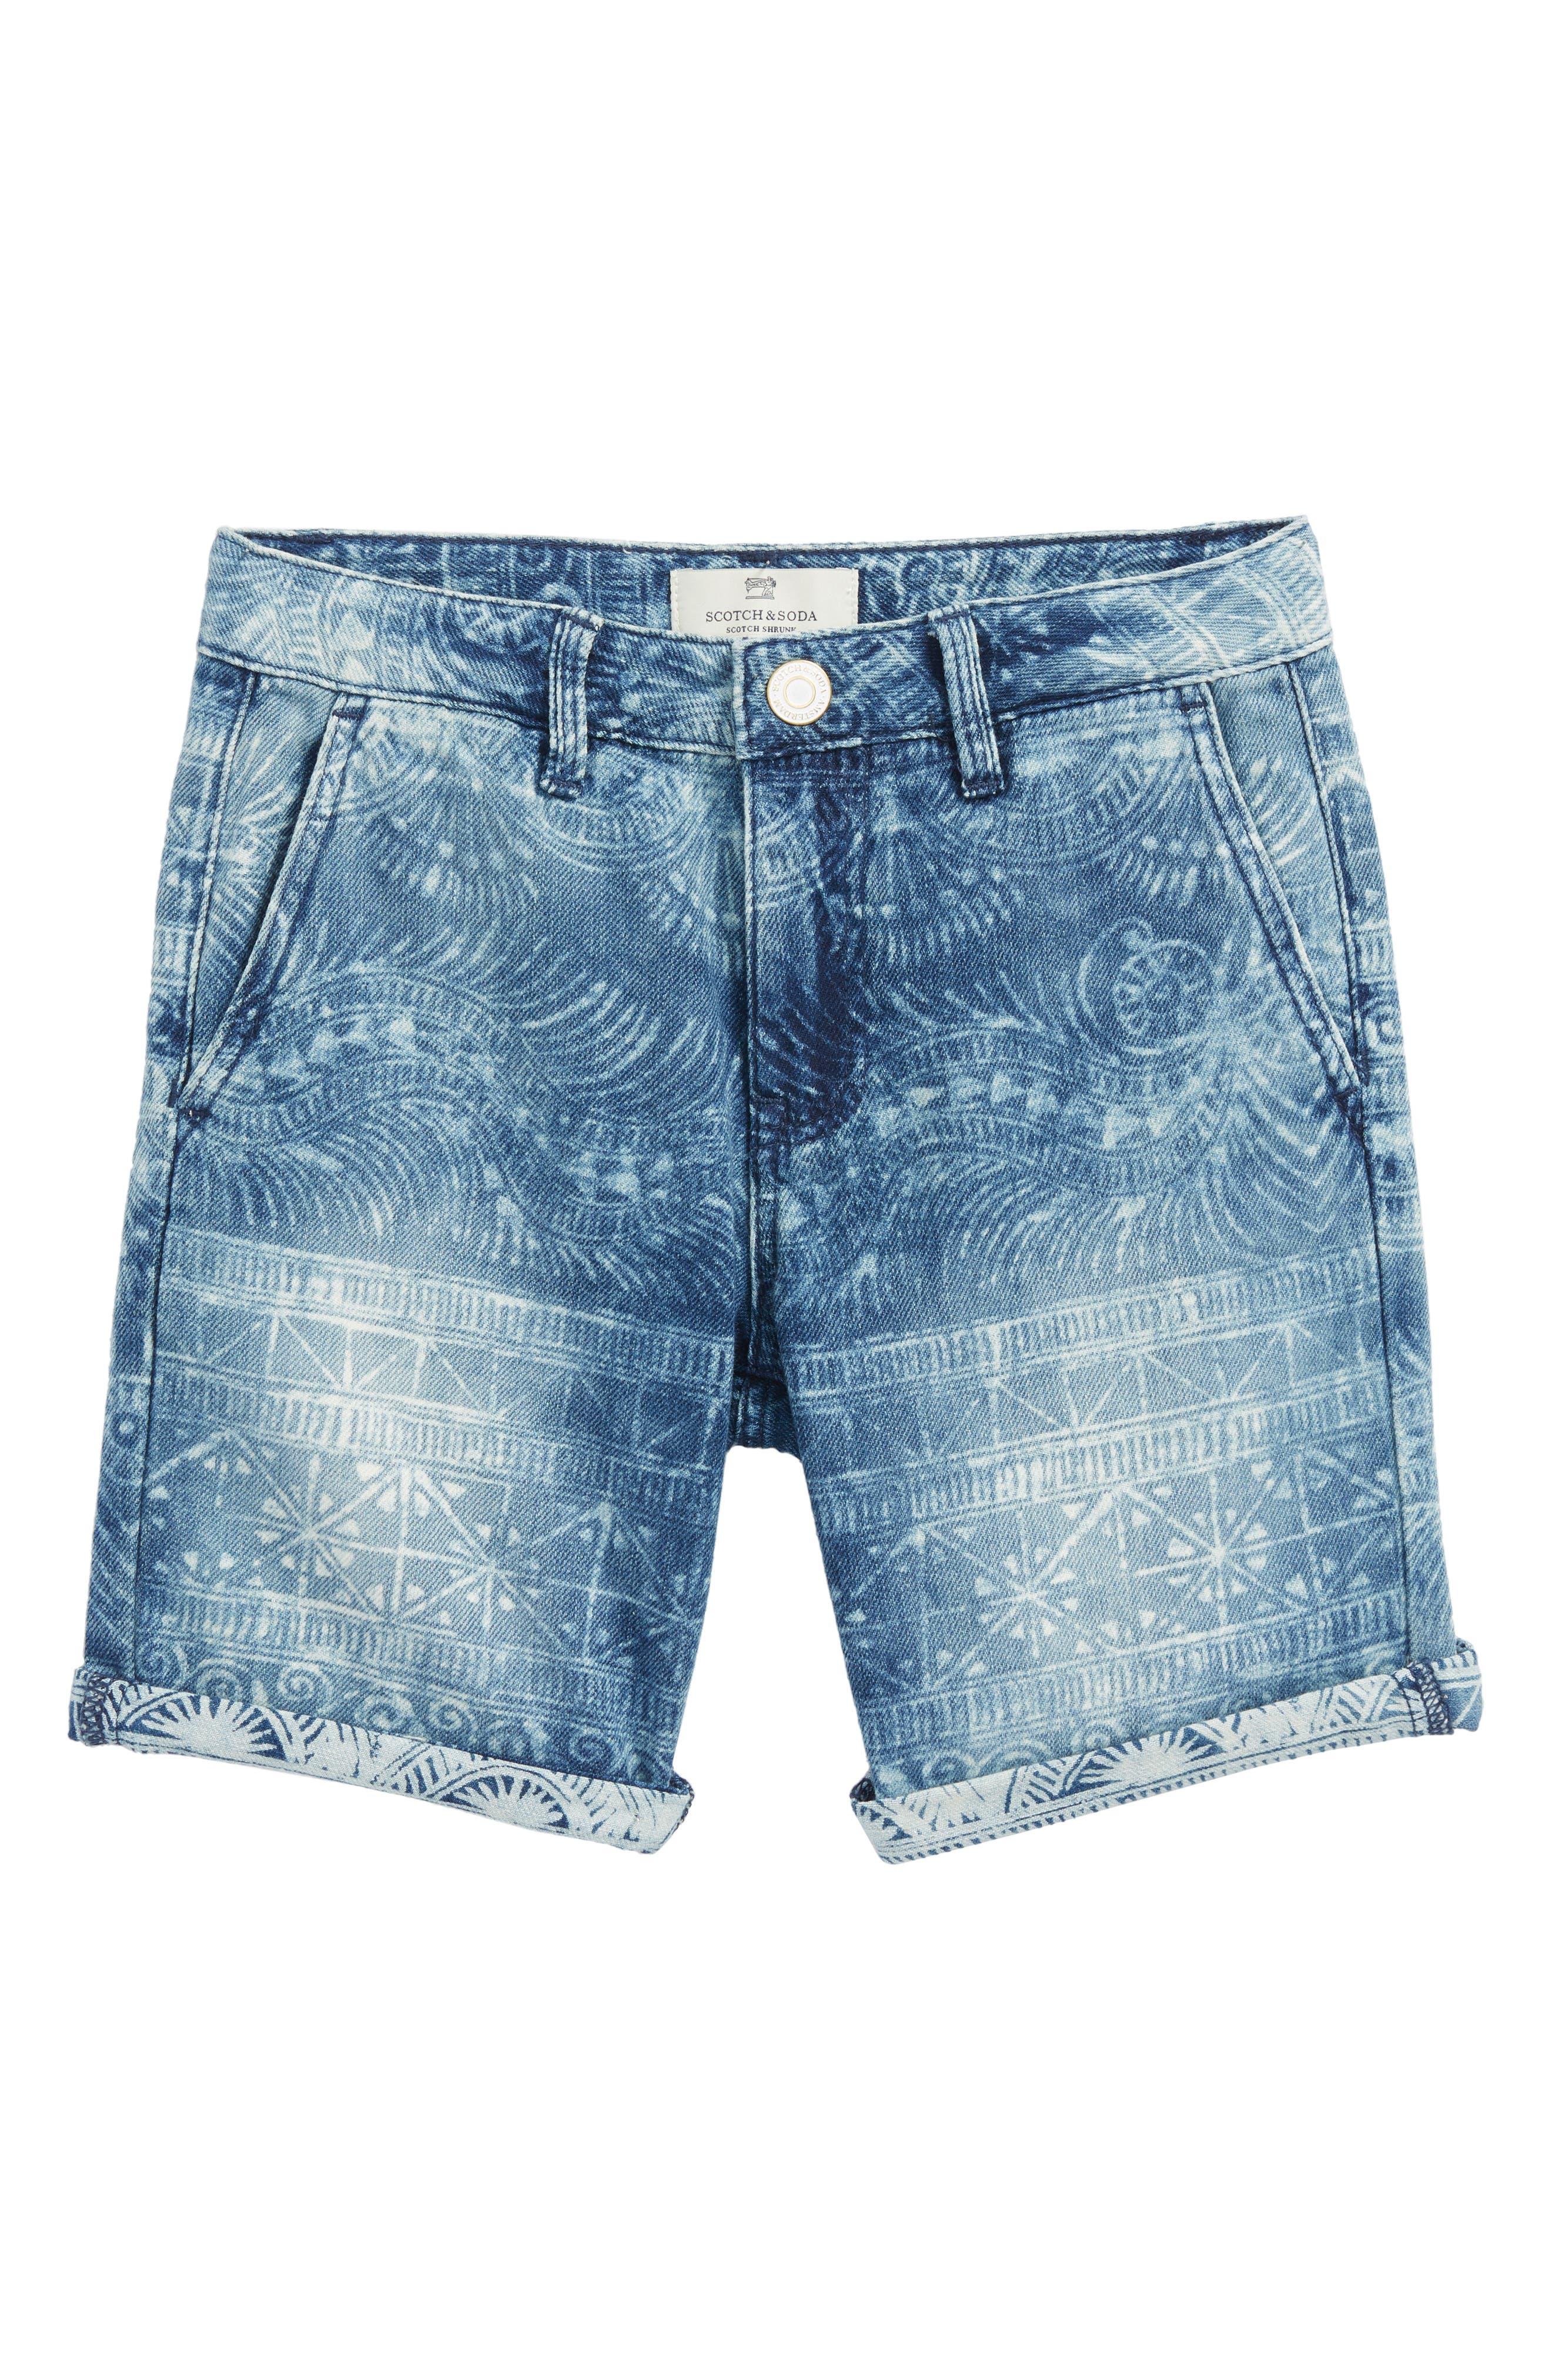 Denim Chino Shorts,                         Main,                         color, Blue